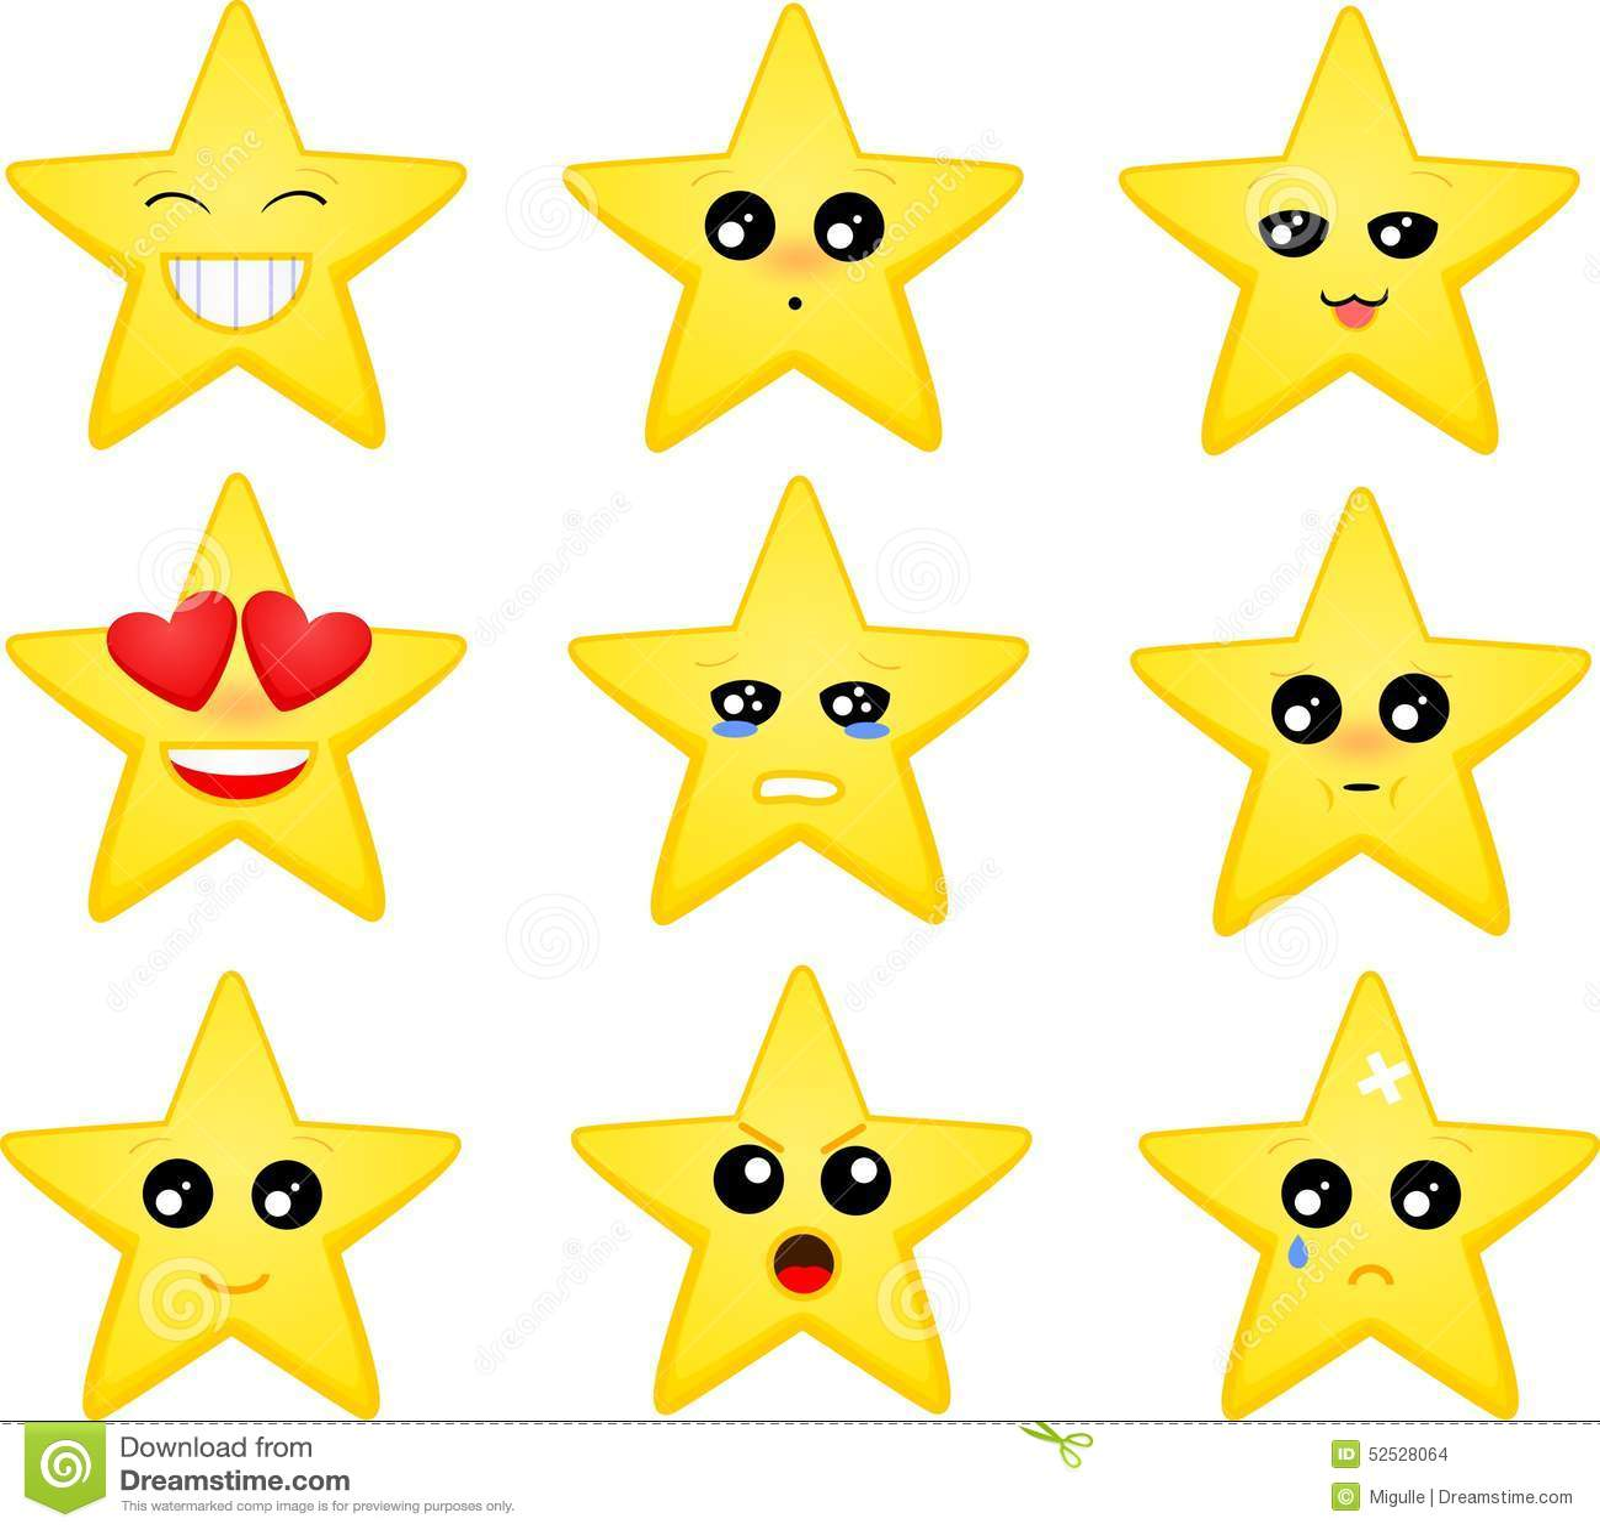 Stock Illustration Set Star Emoticons Vector Cartoon Image52528064 on Children Christmas Clipart